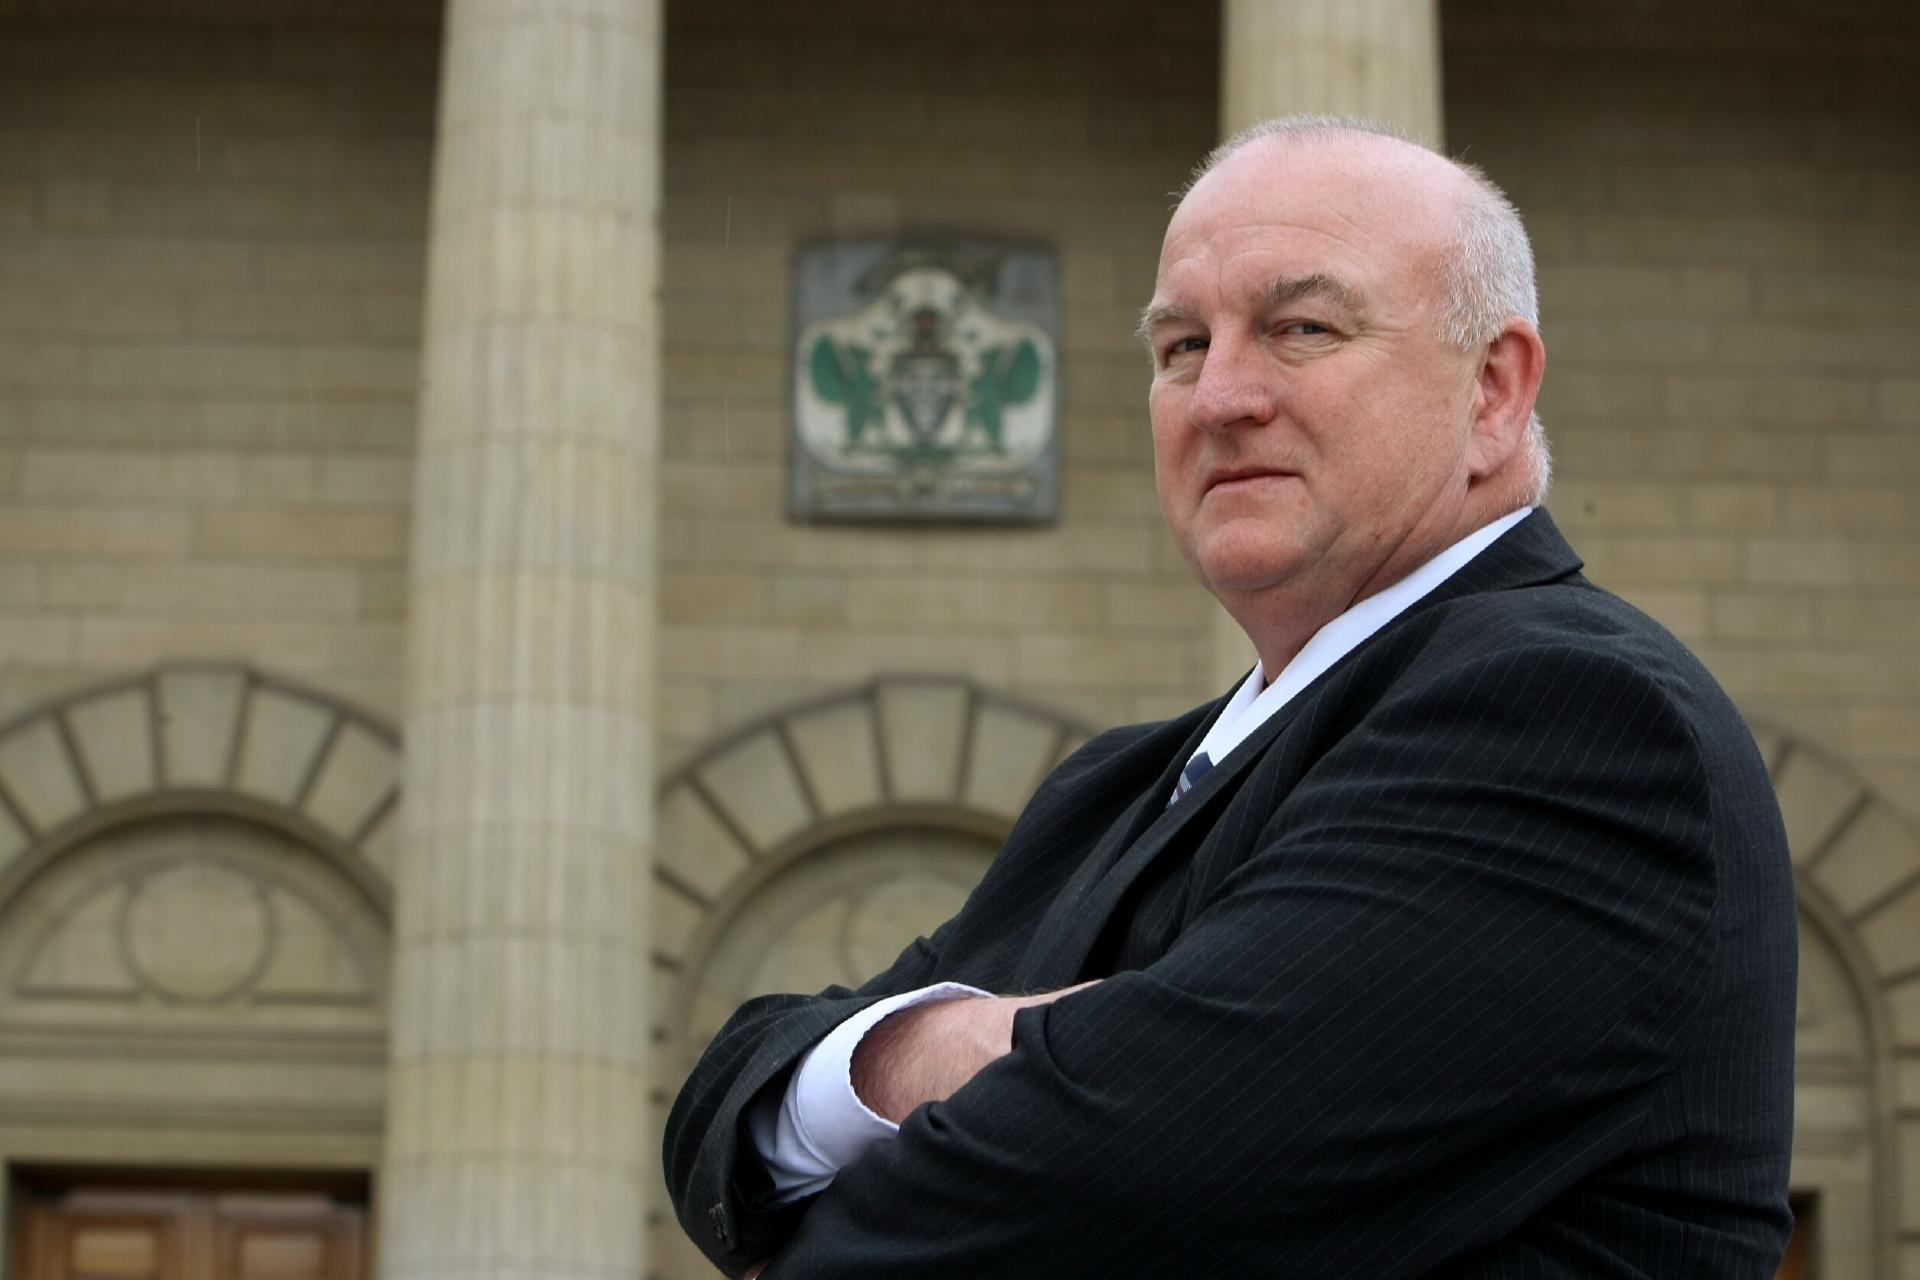 Councillor Keenan.